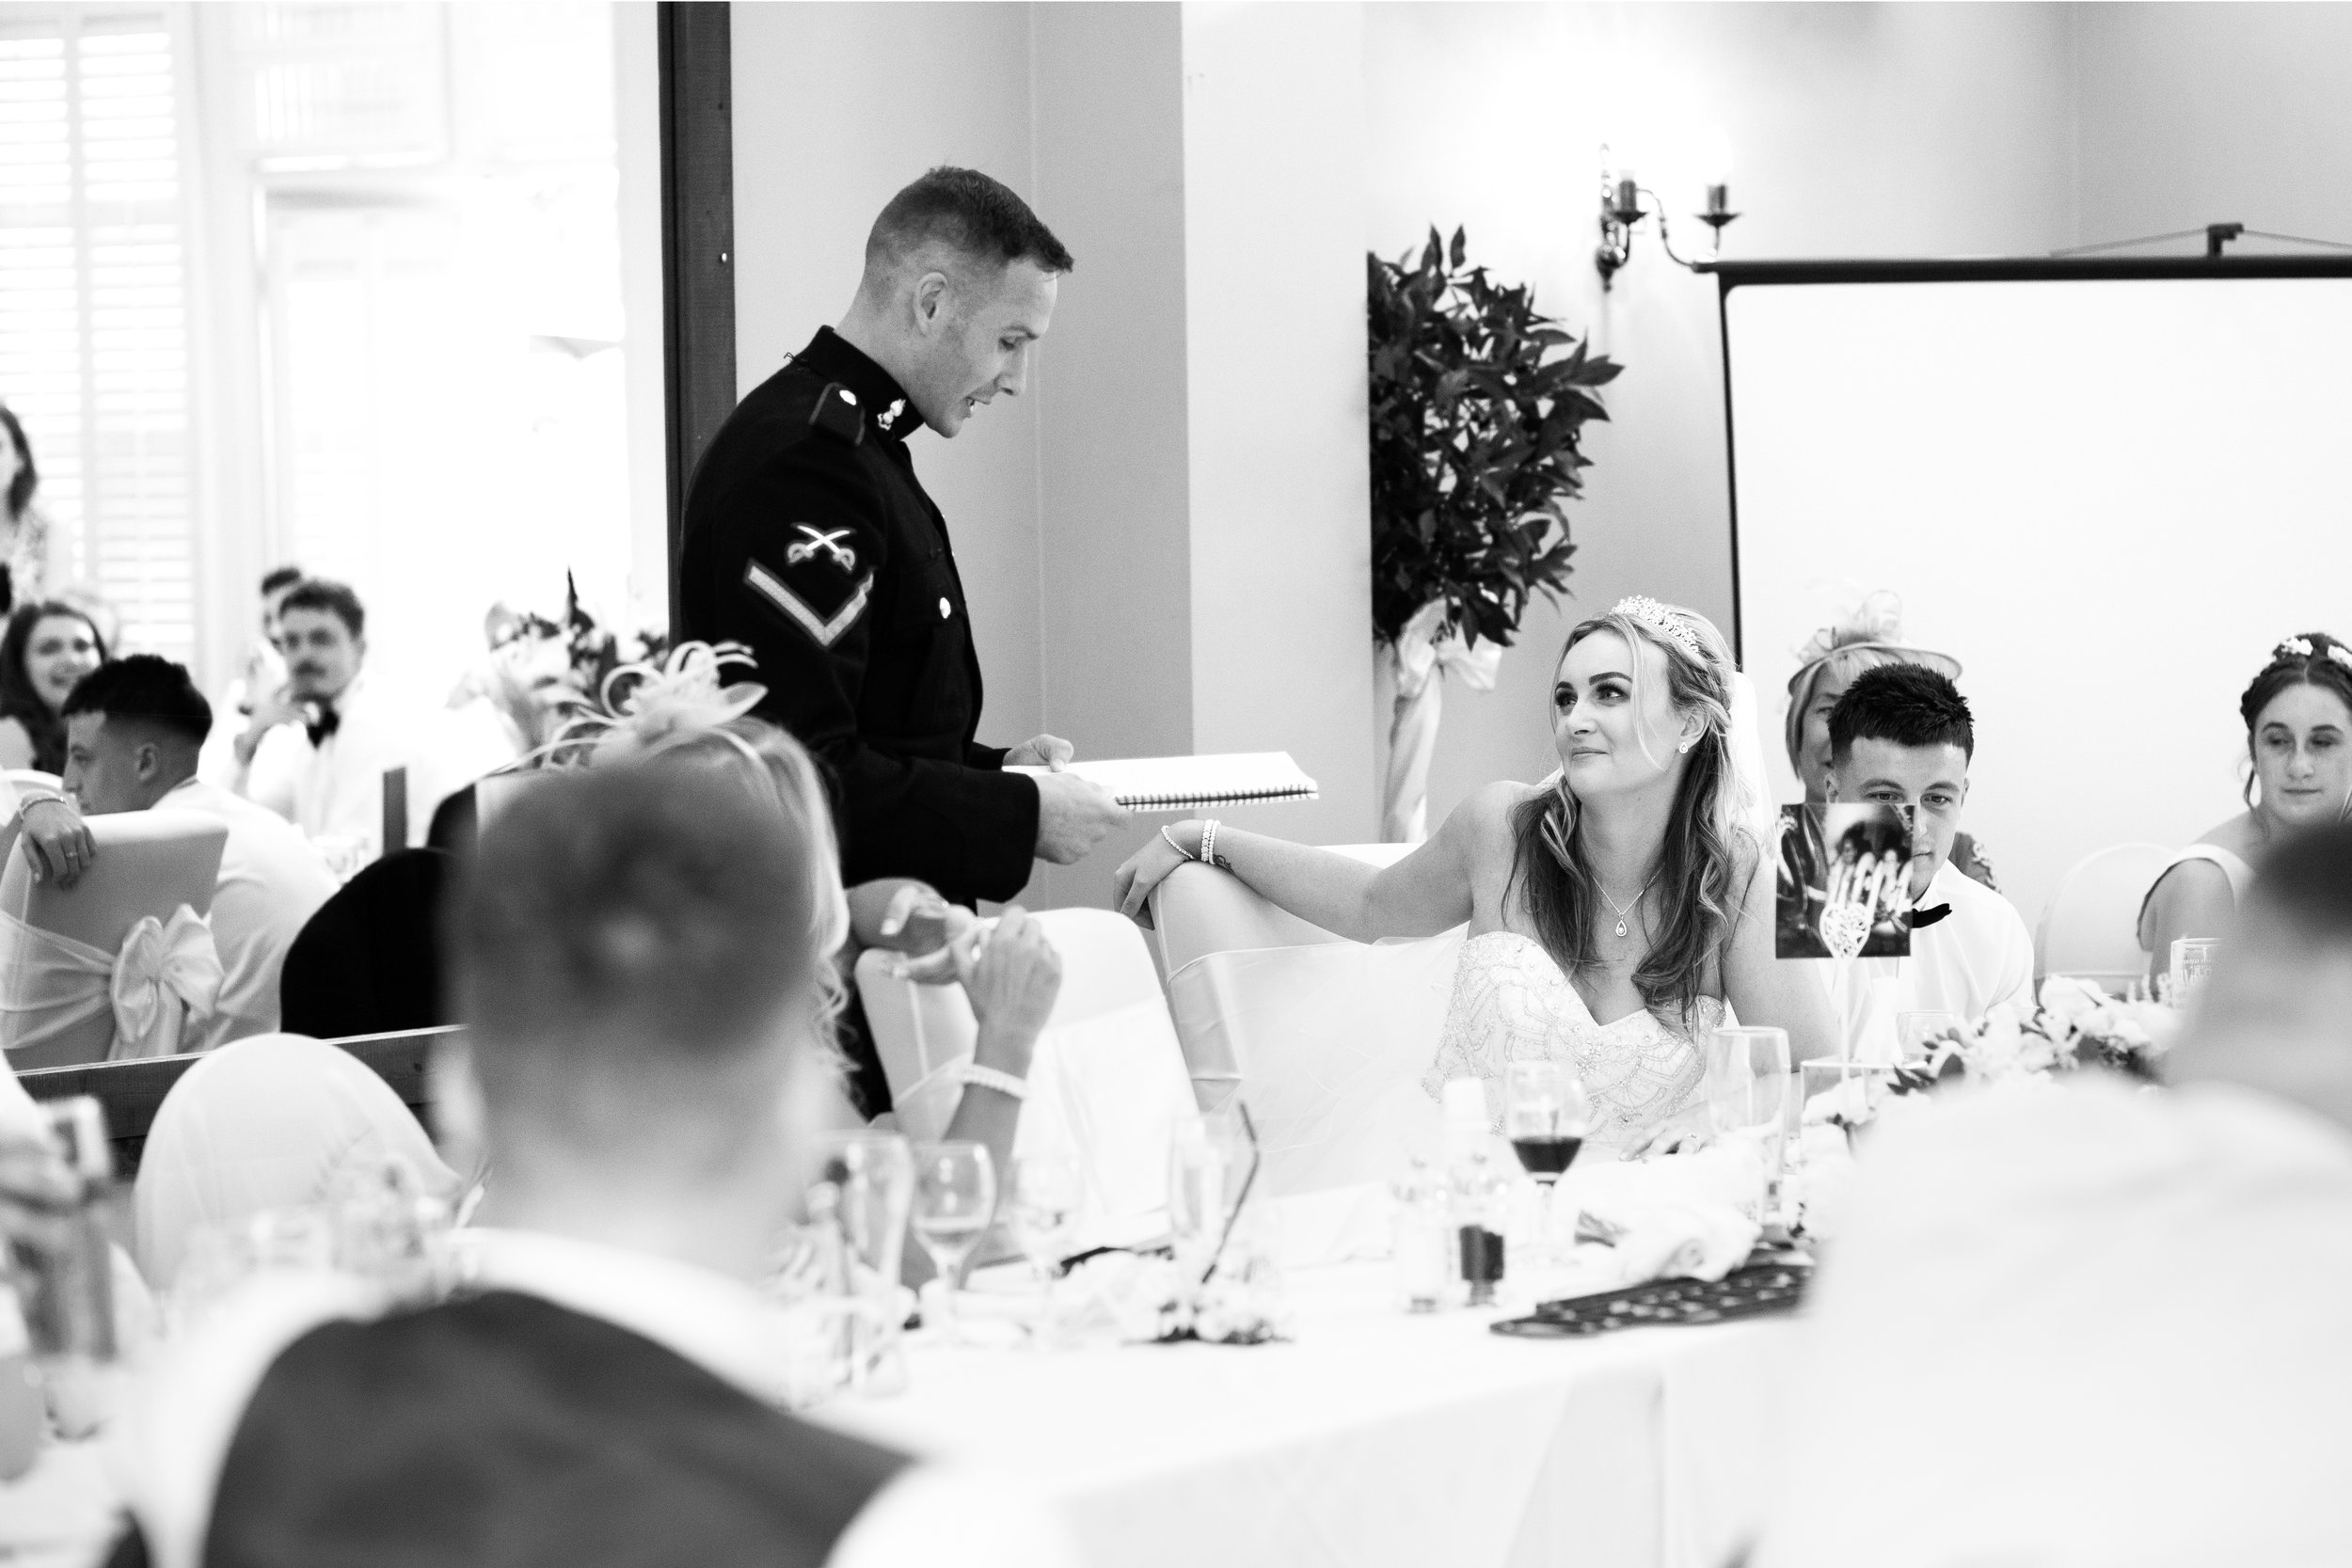 wedding-lea-cooper-photography-willenhall-west-midlands-wolverhampton-dudley-birmingham-uk-marriage-hadley-park-east-telford-happy-couple.jpg